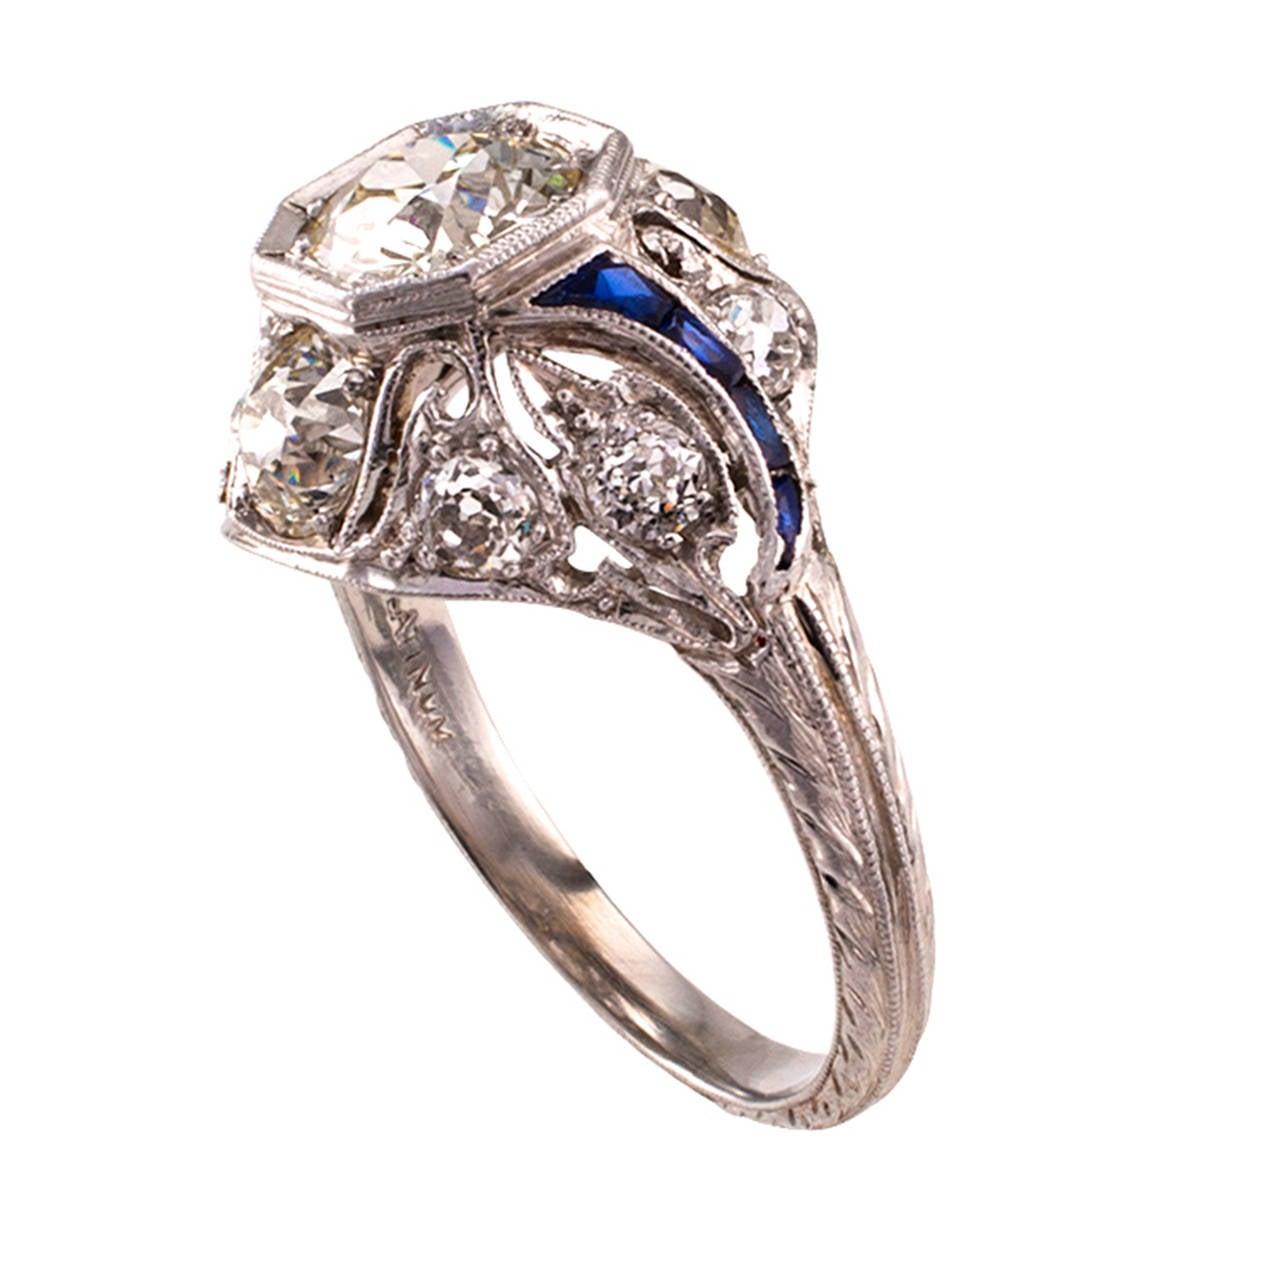 1920s deco 1 00 carat platinum engagement ring at 1stdibs